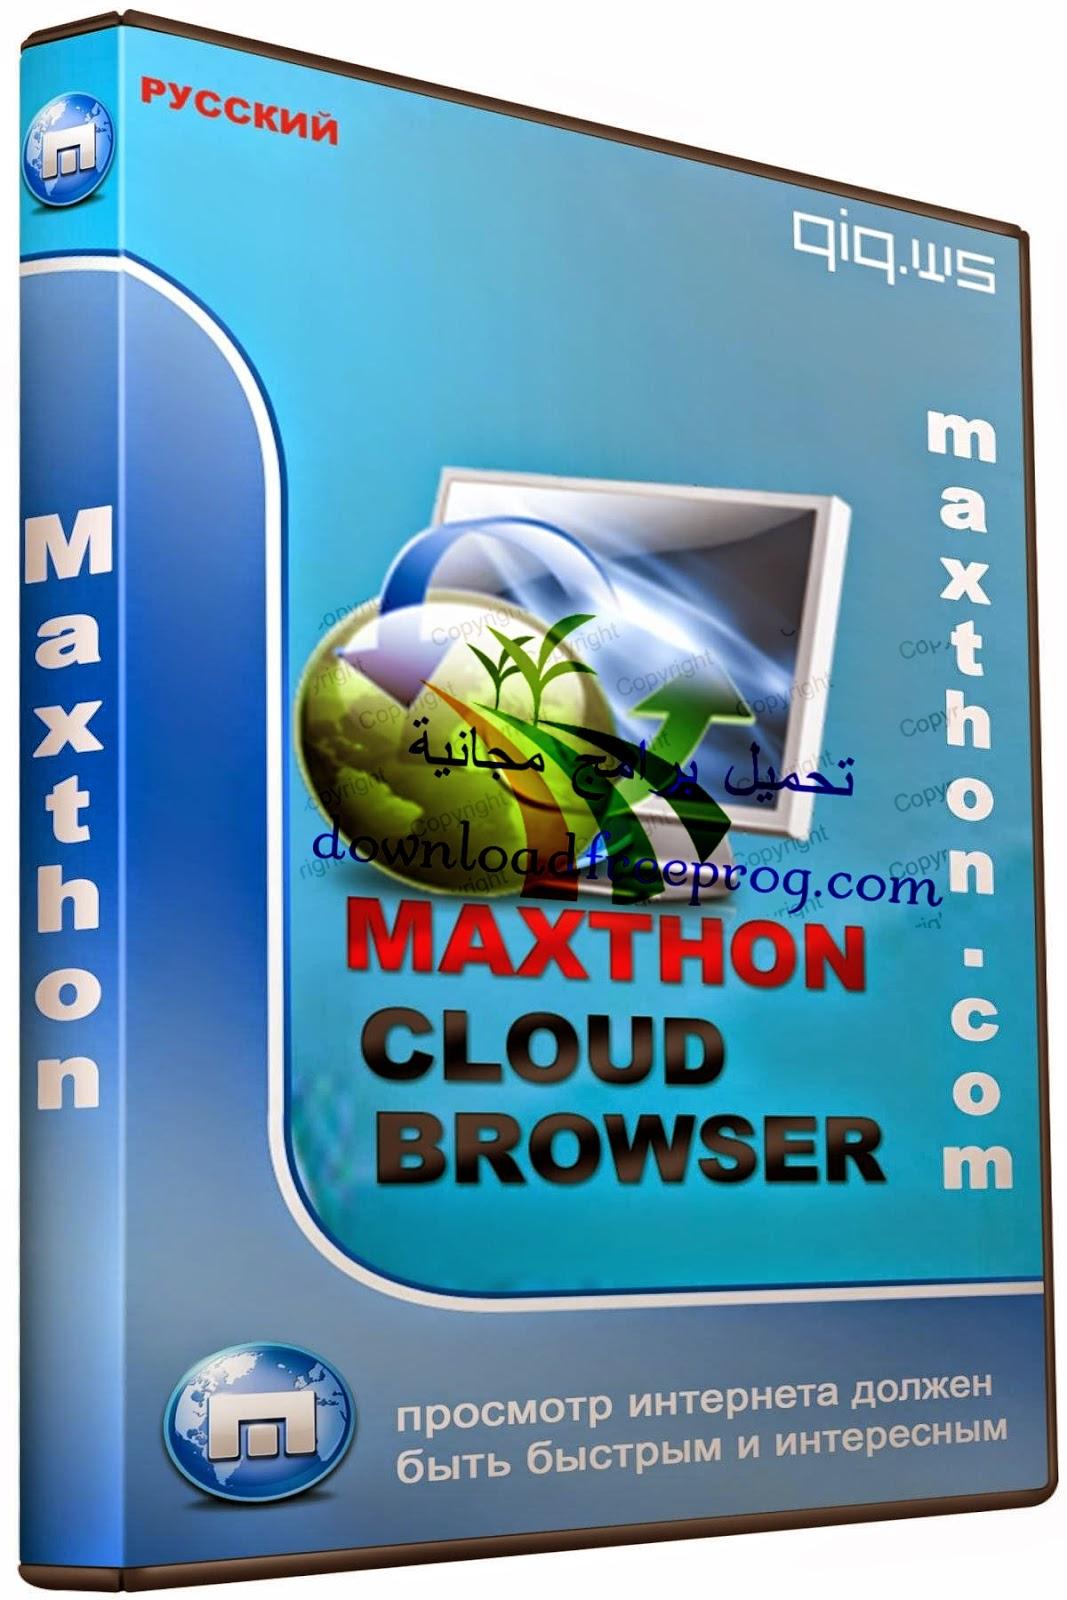 تحميل برنامج Maxthon Cloud Browser 4.4.1.5000 مجانا